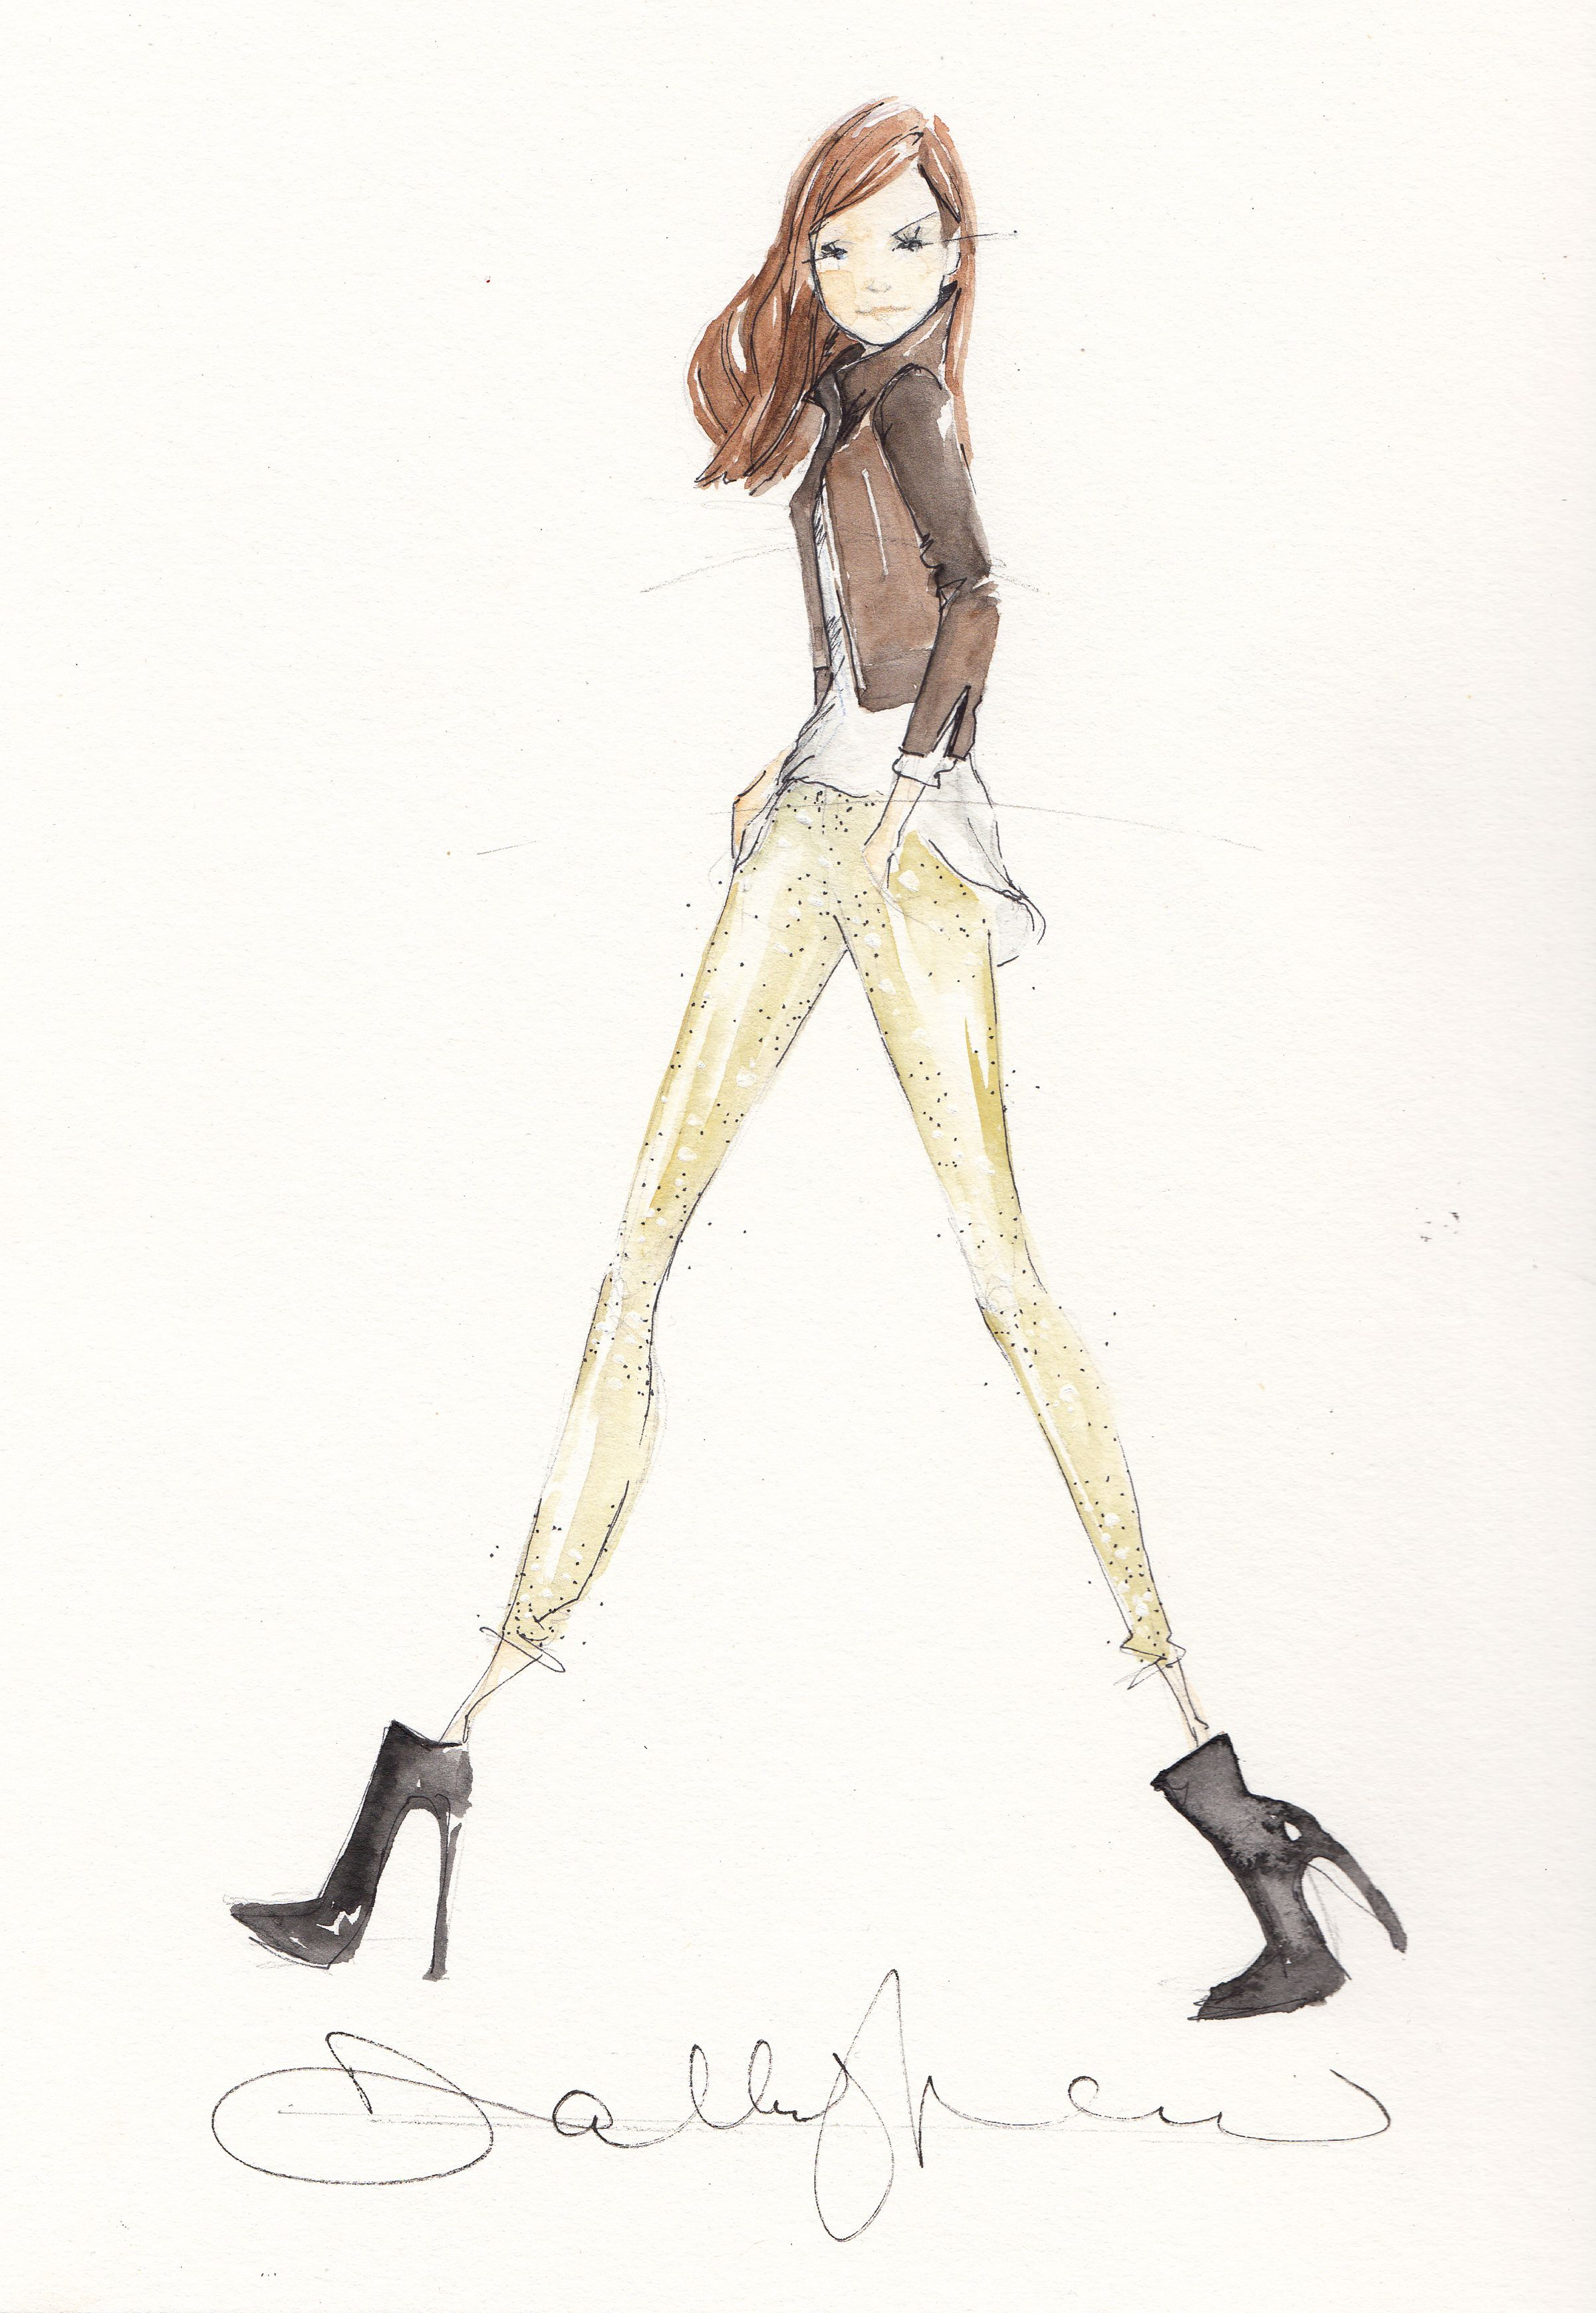 Lovely artistic illustration style—artist, Dallas Shaw❣ dallasshaw.com